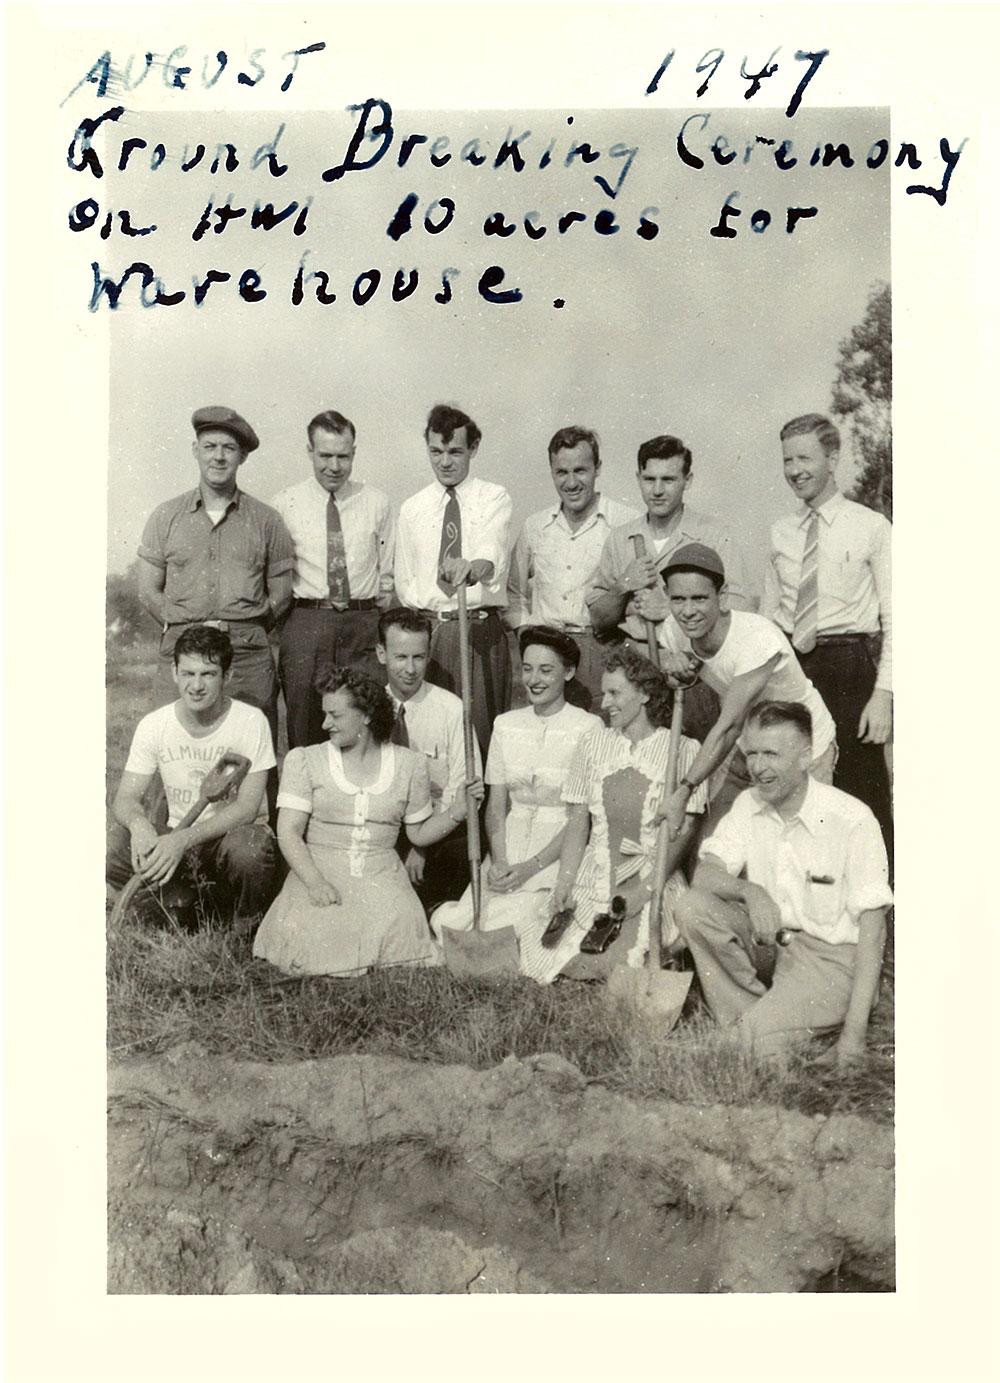 In 1947